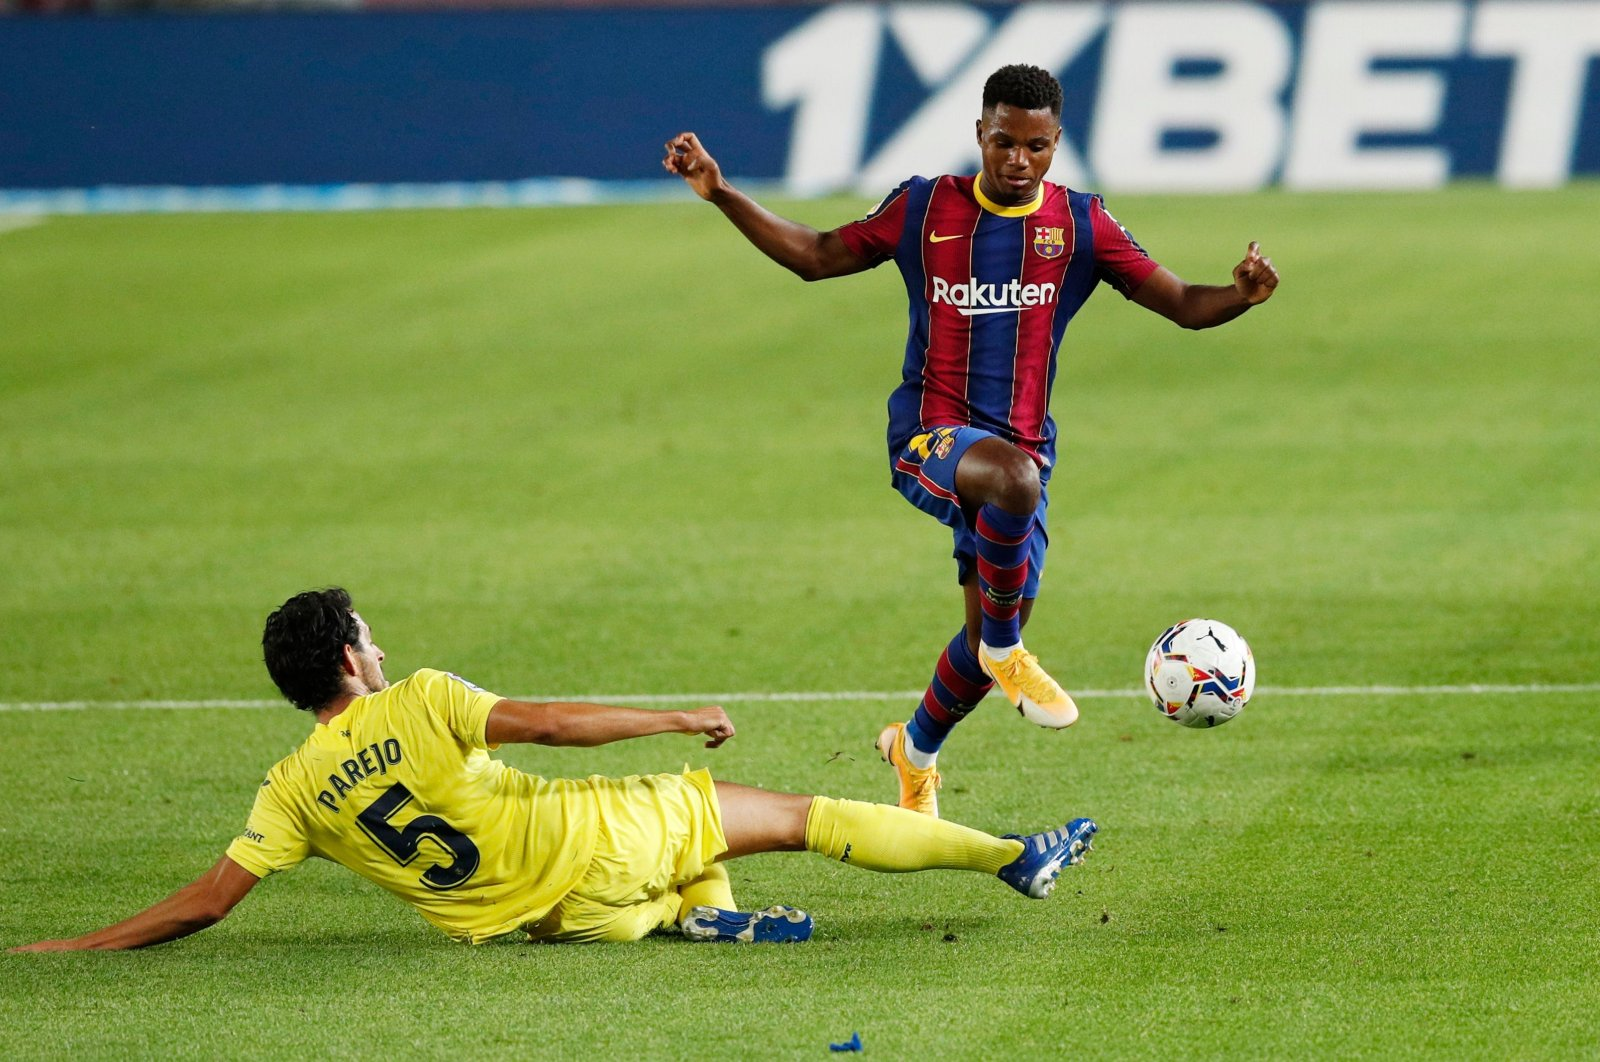 Villarreal's Dani Parejo (L ) in action with Barcelona's Ansu Fati (R), in Barcelona, Spain, Sept. 27, 2020. (REUTERS Photo)